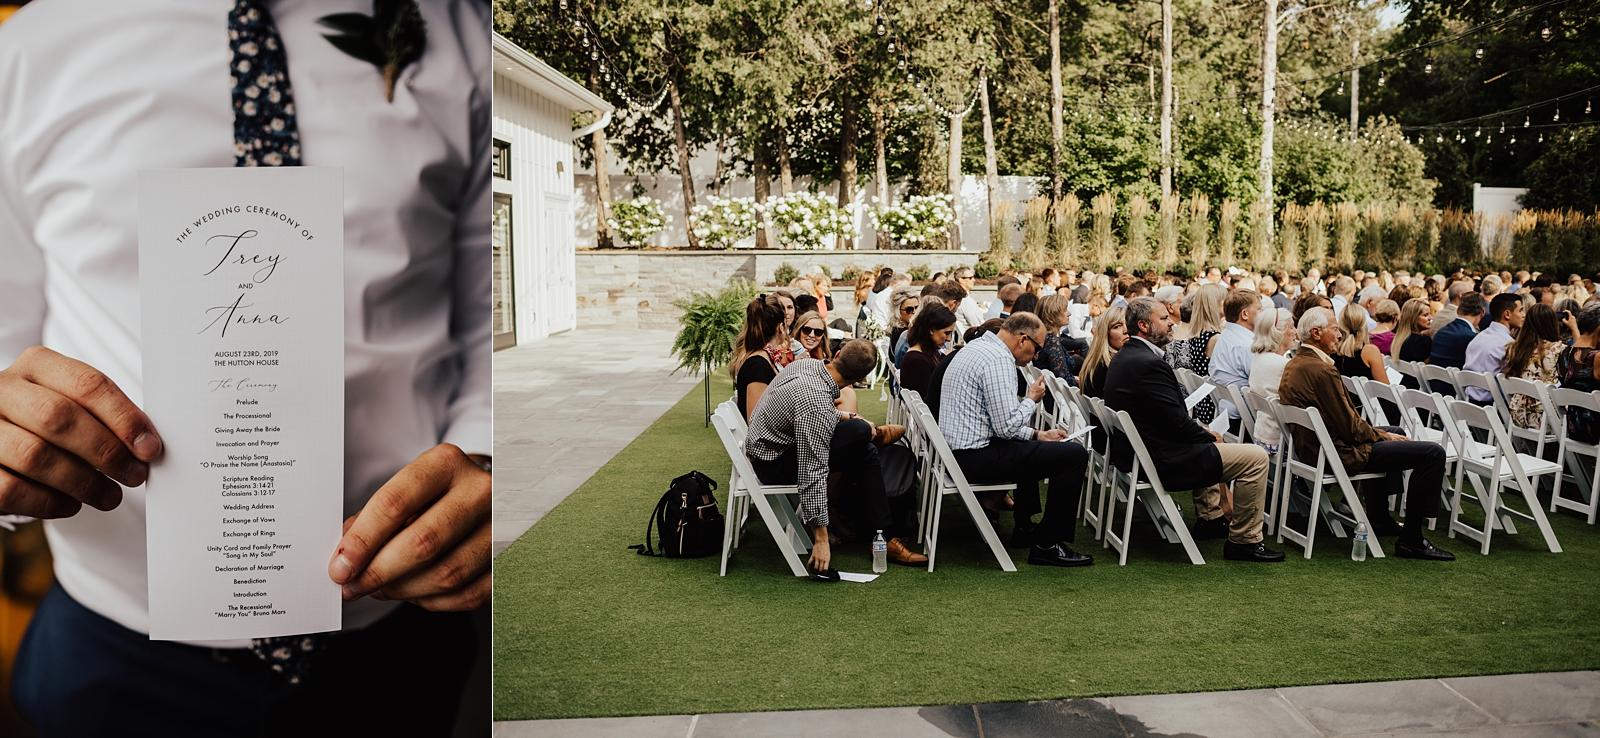 Anna & Trey Modern Minneapolis Wedding at The Hutton House_0712.jpg